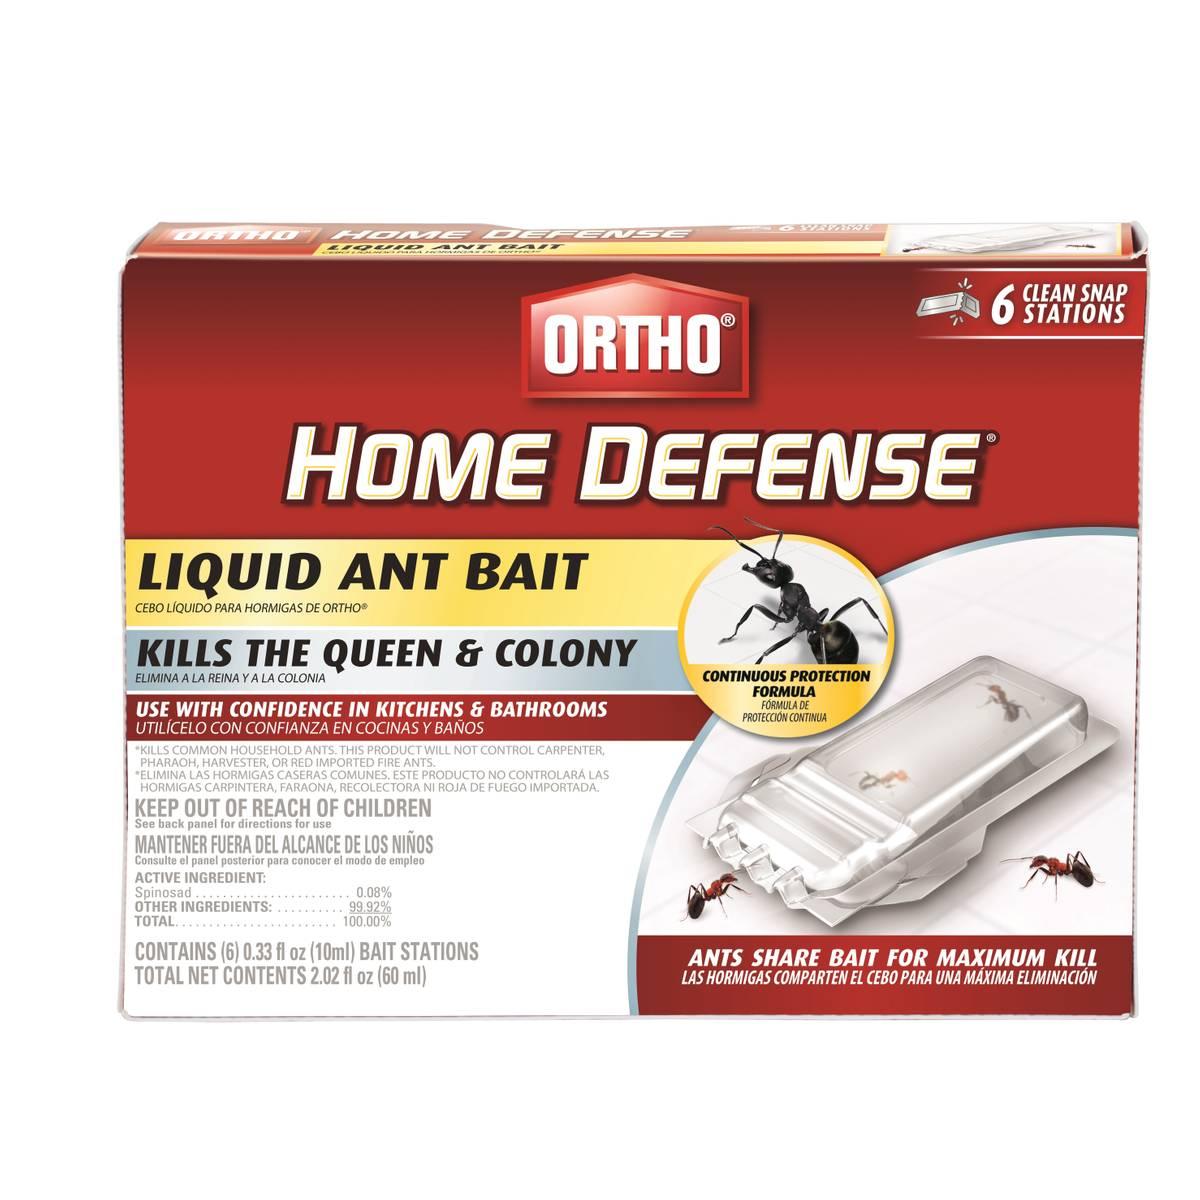 Ortho Home Defense Liquid Ant Bait